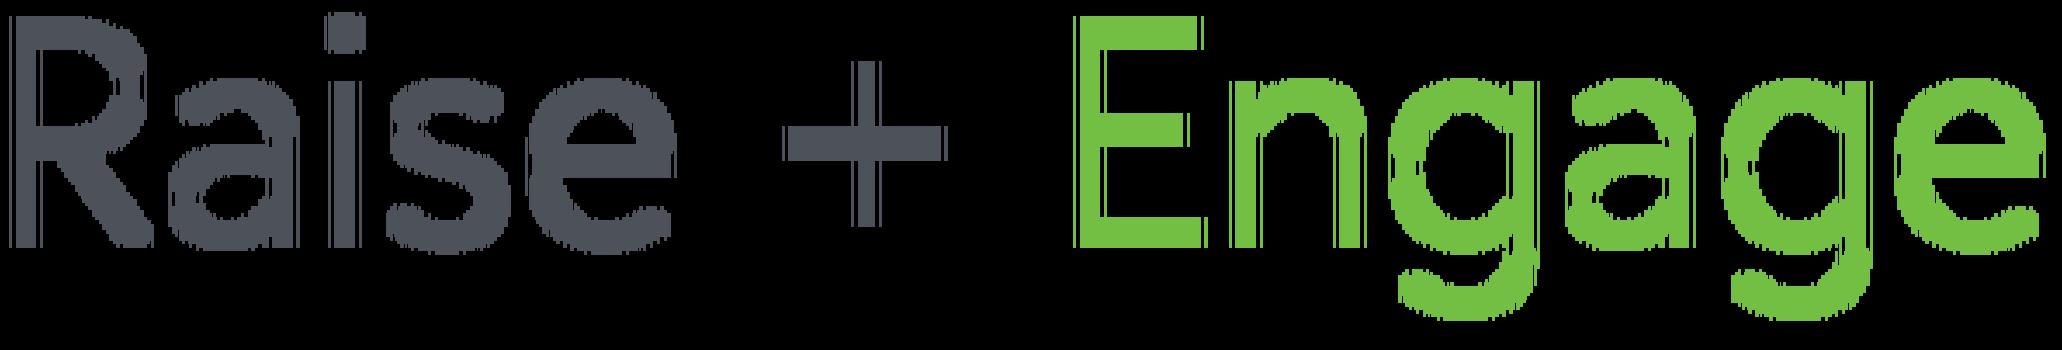 #NOFILTERNONPROFIT logo